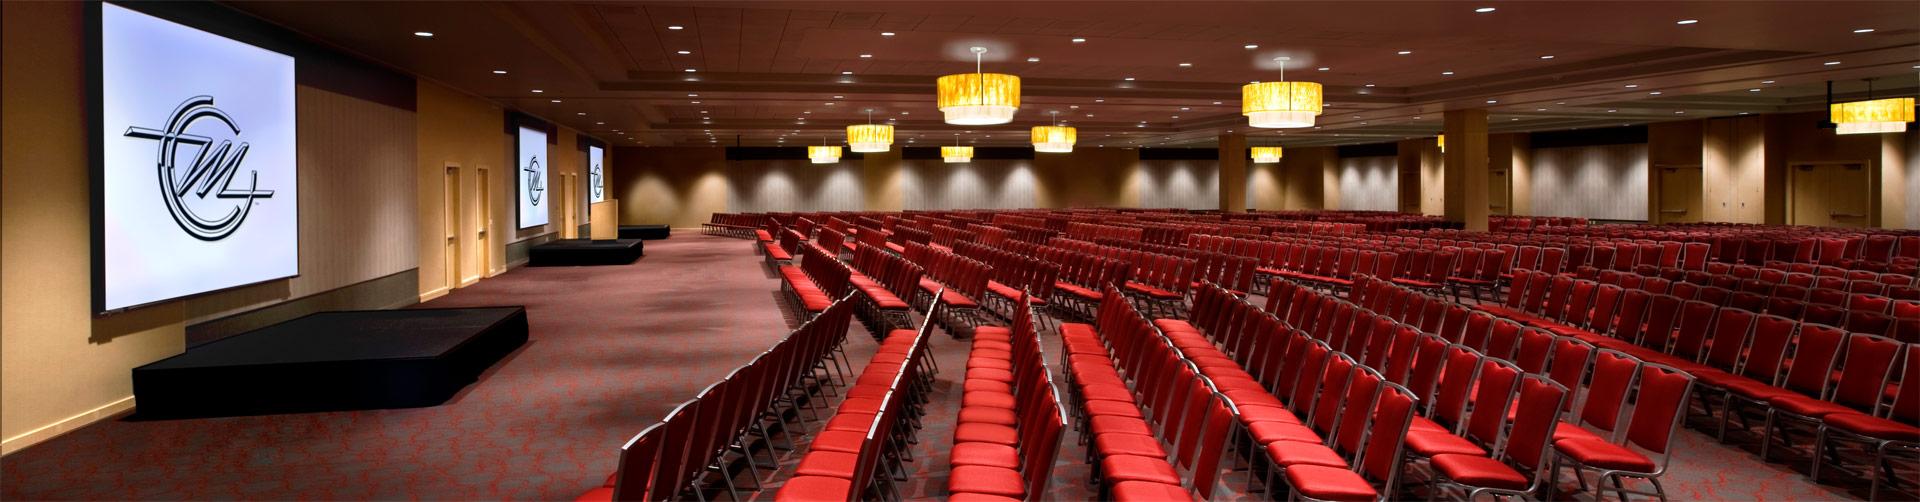 Motor city casino concert women and online gambling history